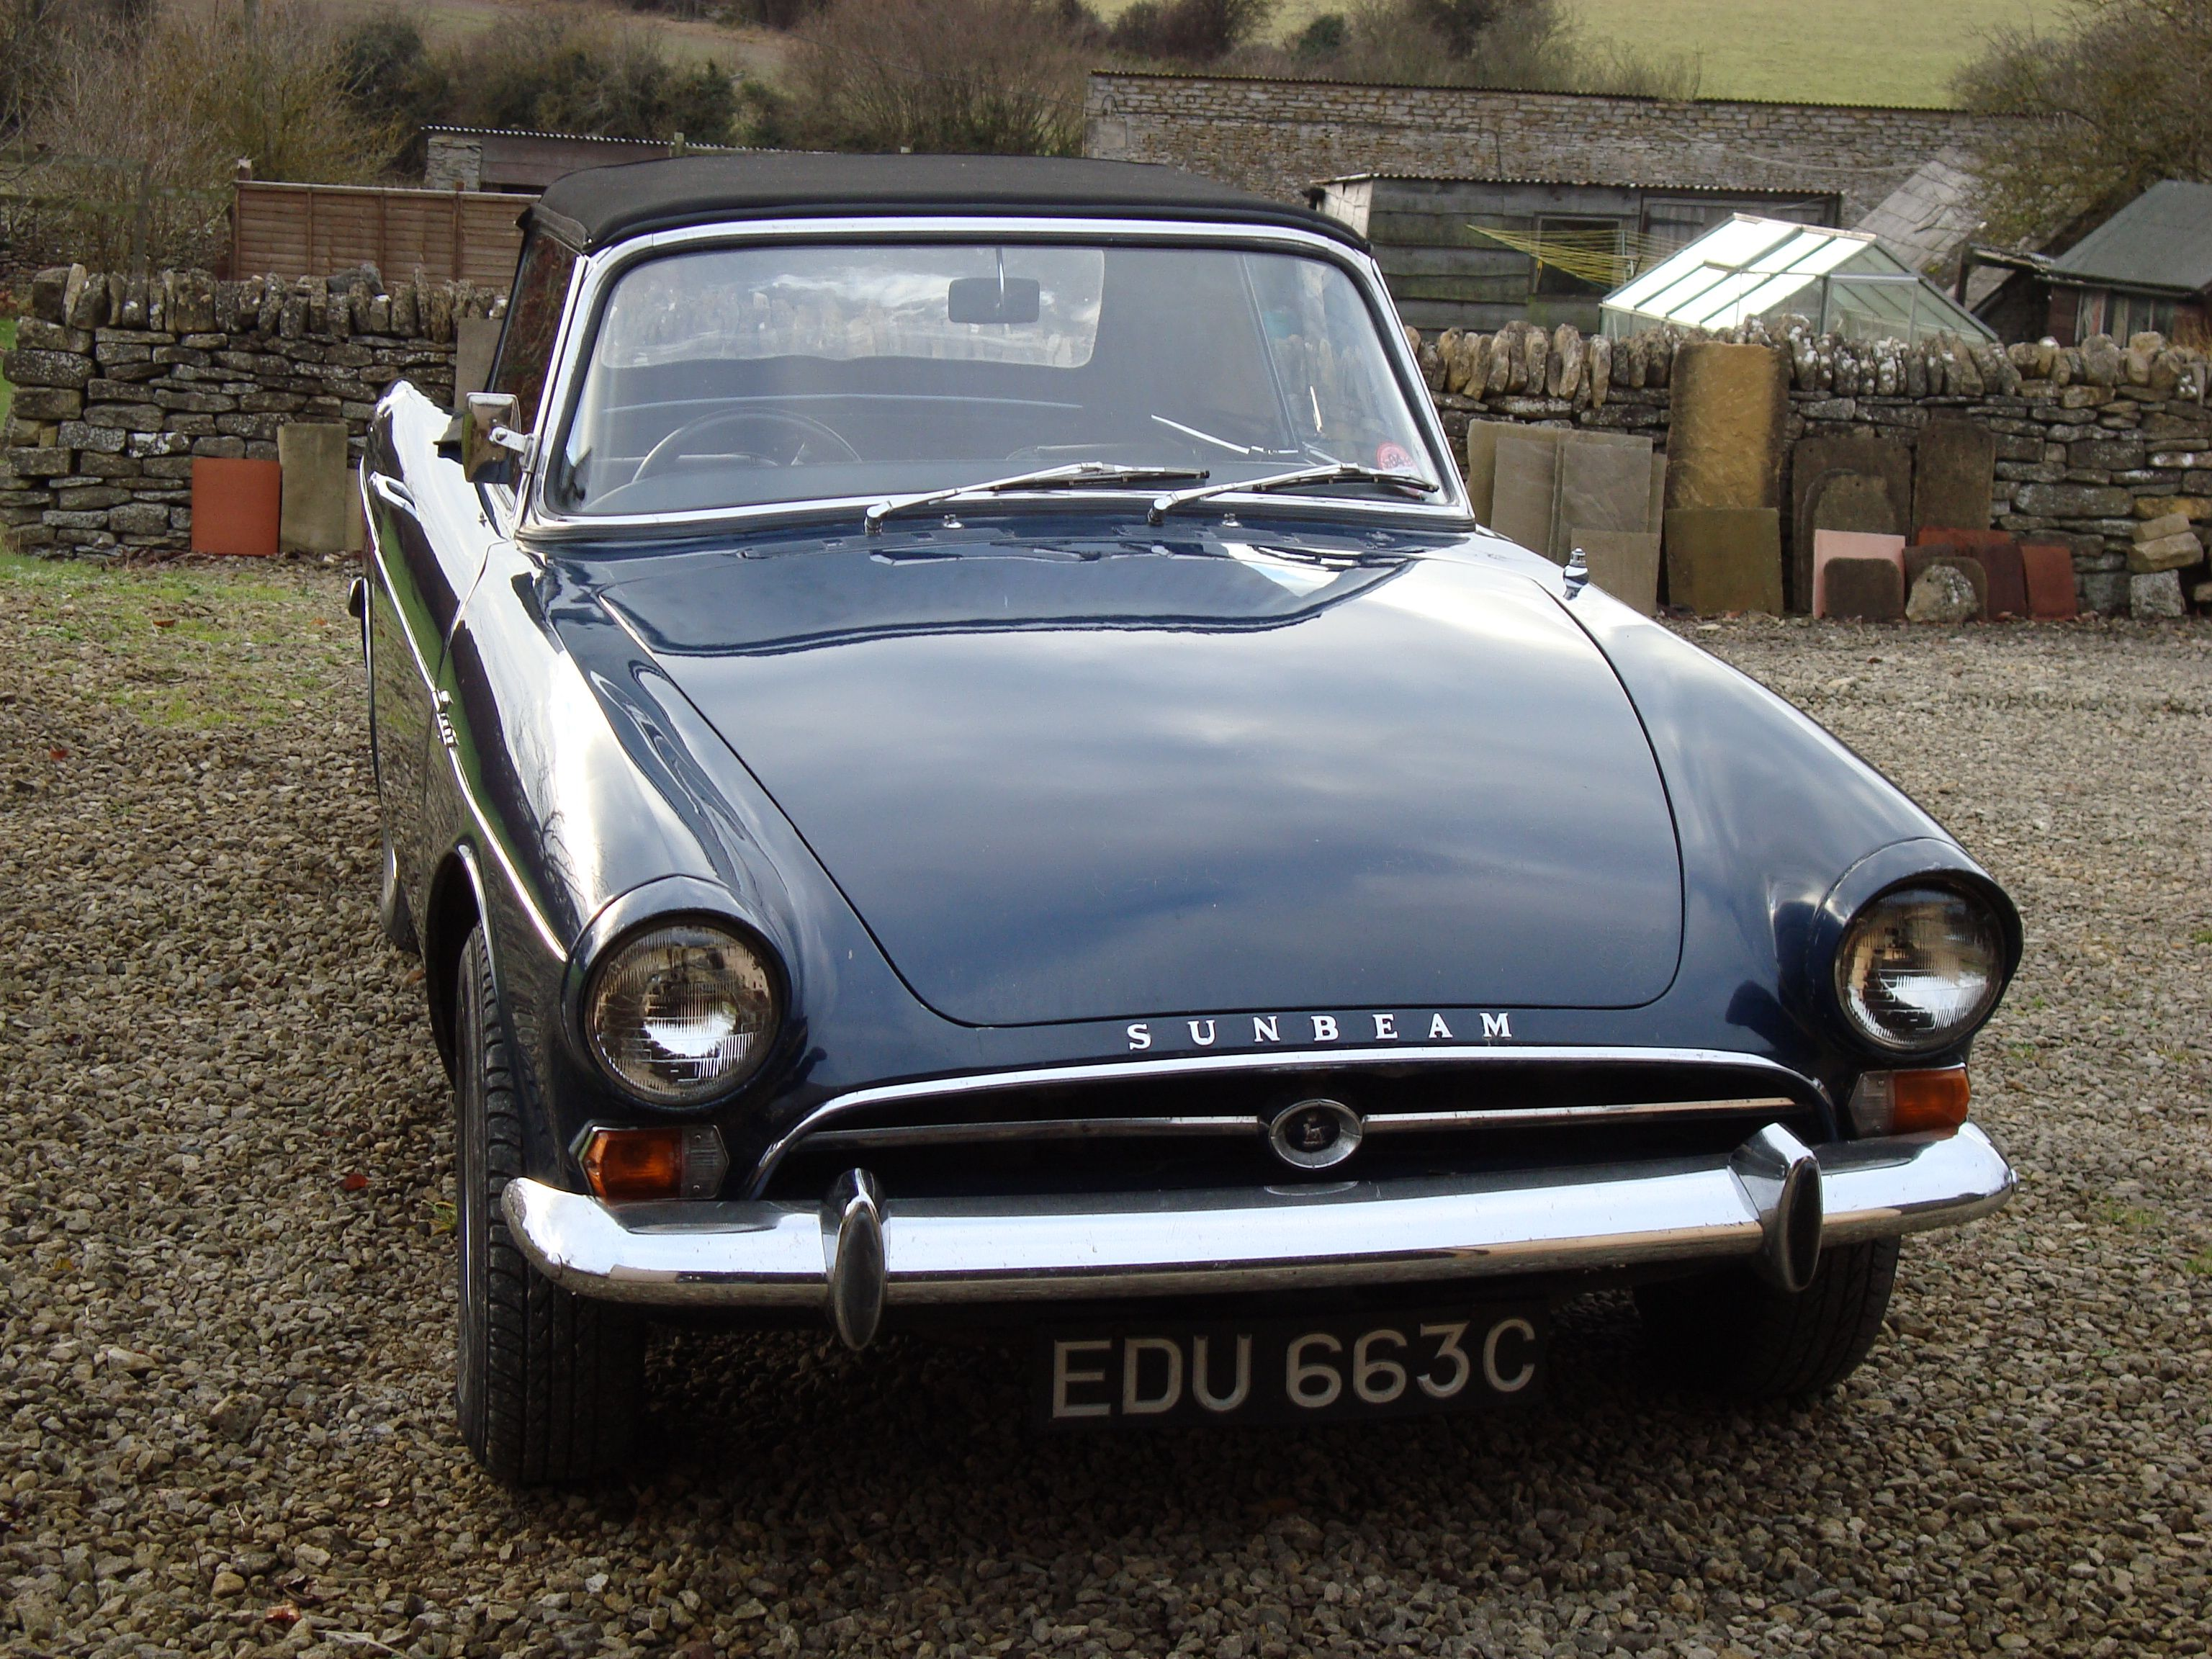 vintage car sunbeam tiger | 1965 Sunbeam Tiger EDU 663C - Classic Car Link - Find Your Old Car